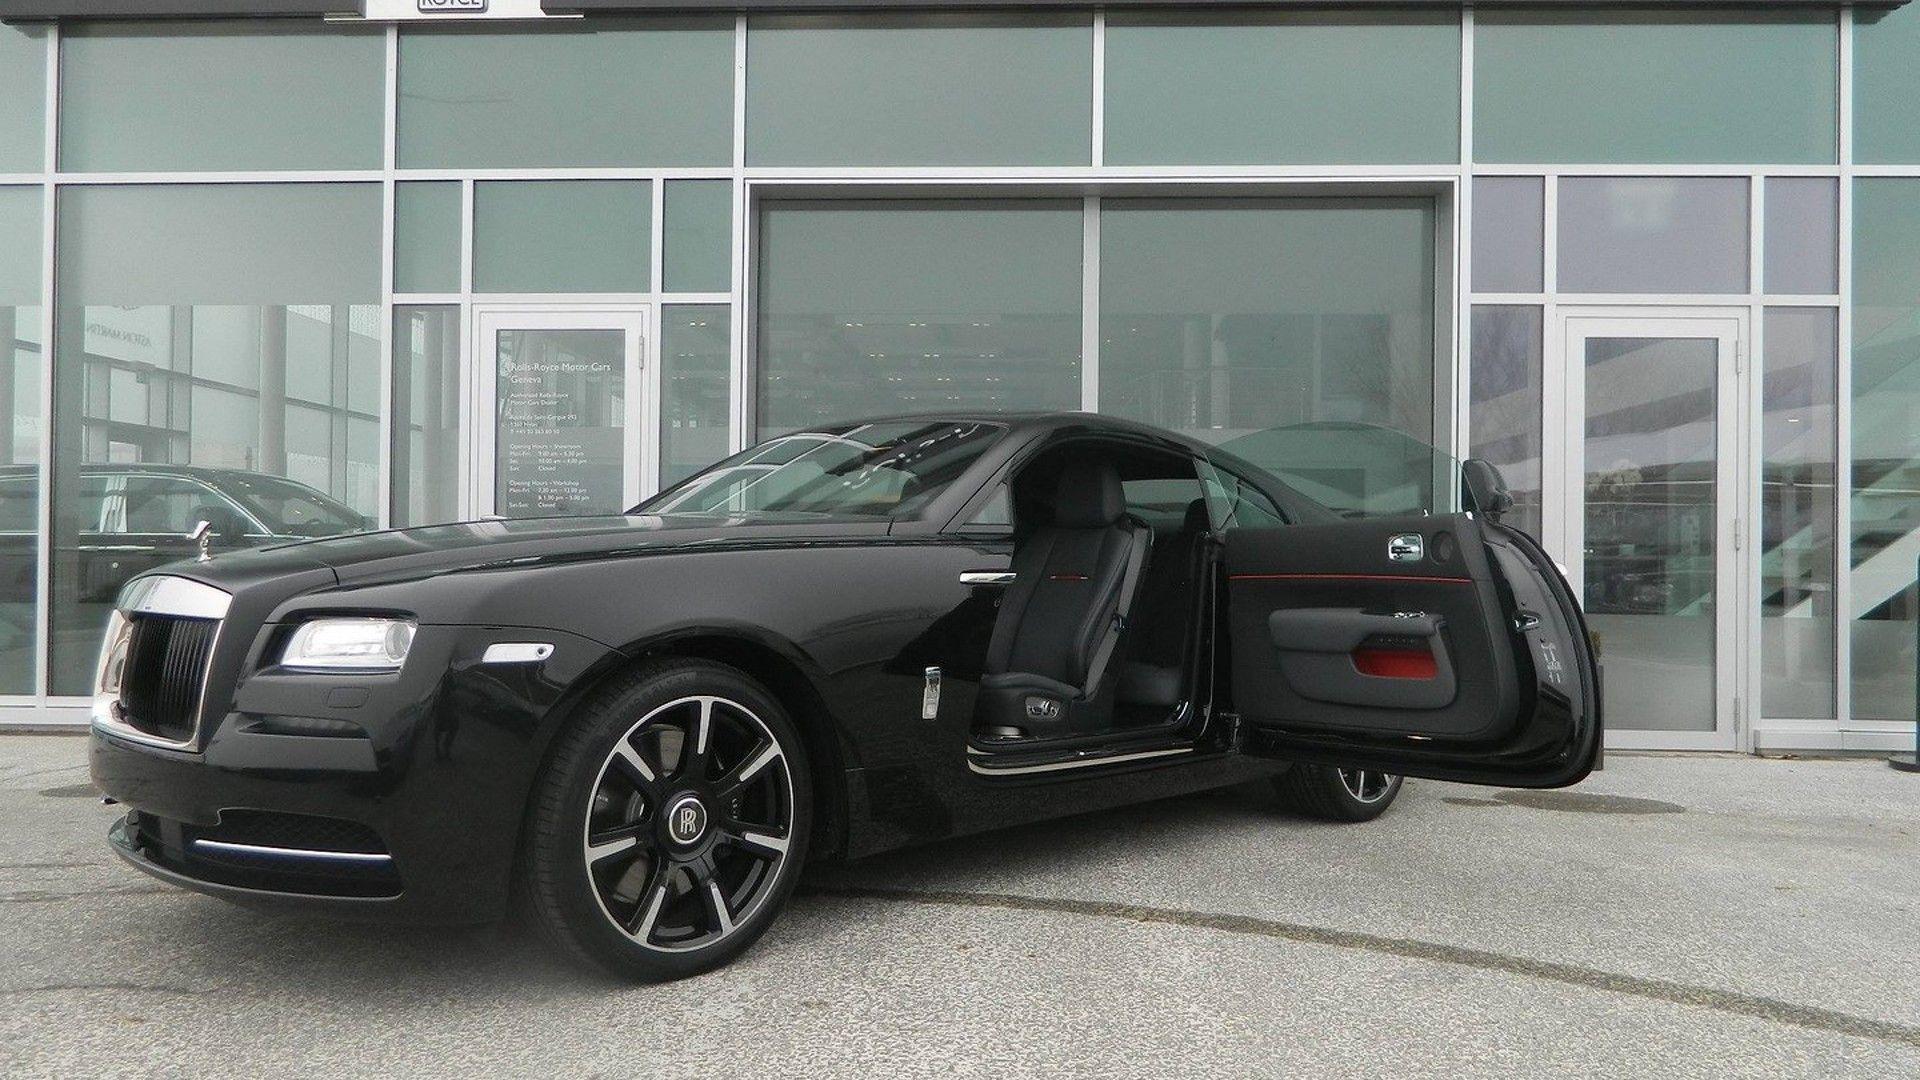 Pin By Gov Landrum On Precision Rolls Royce Rolls Royce Wraith Rolls Royce Motor Cars